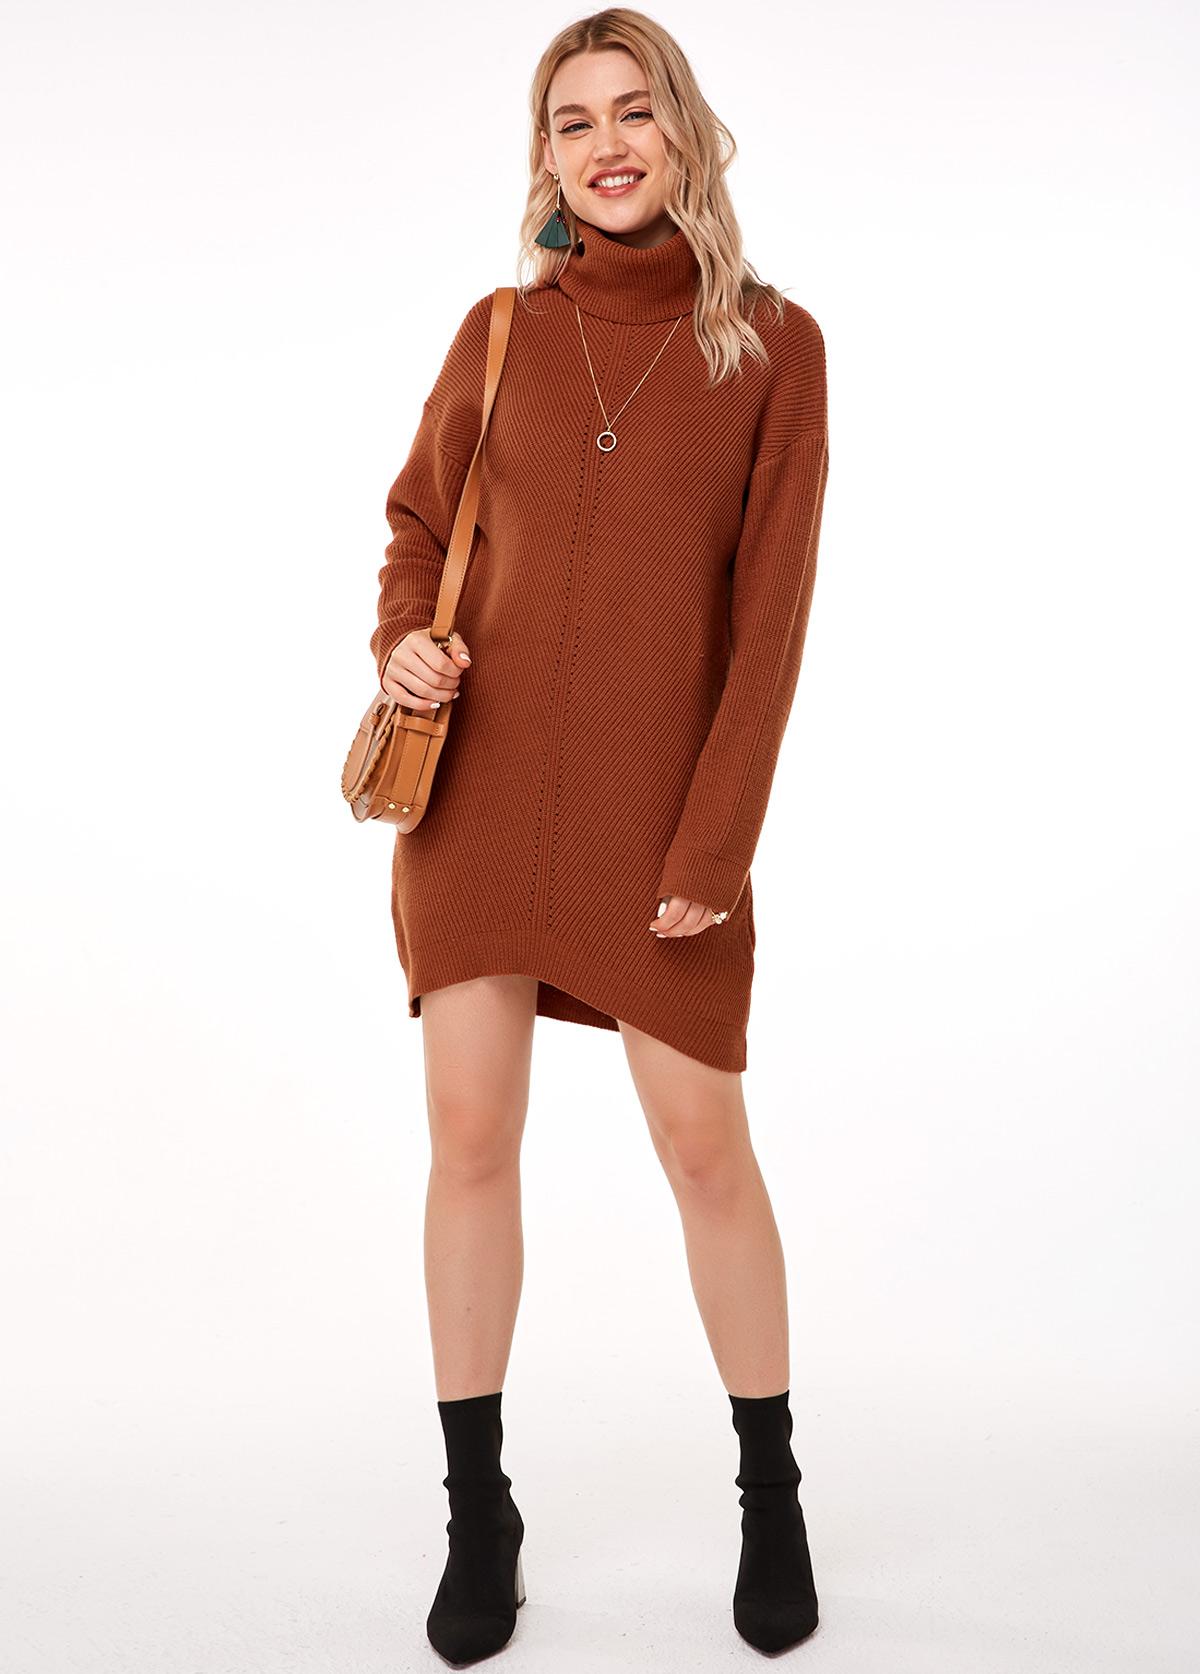 Long Sleeve Brick Red Turtleneck Sweater Dress